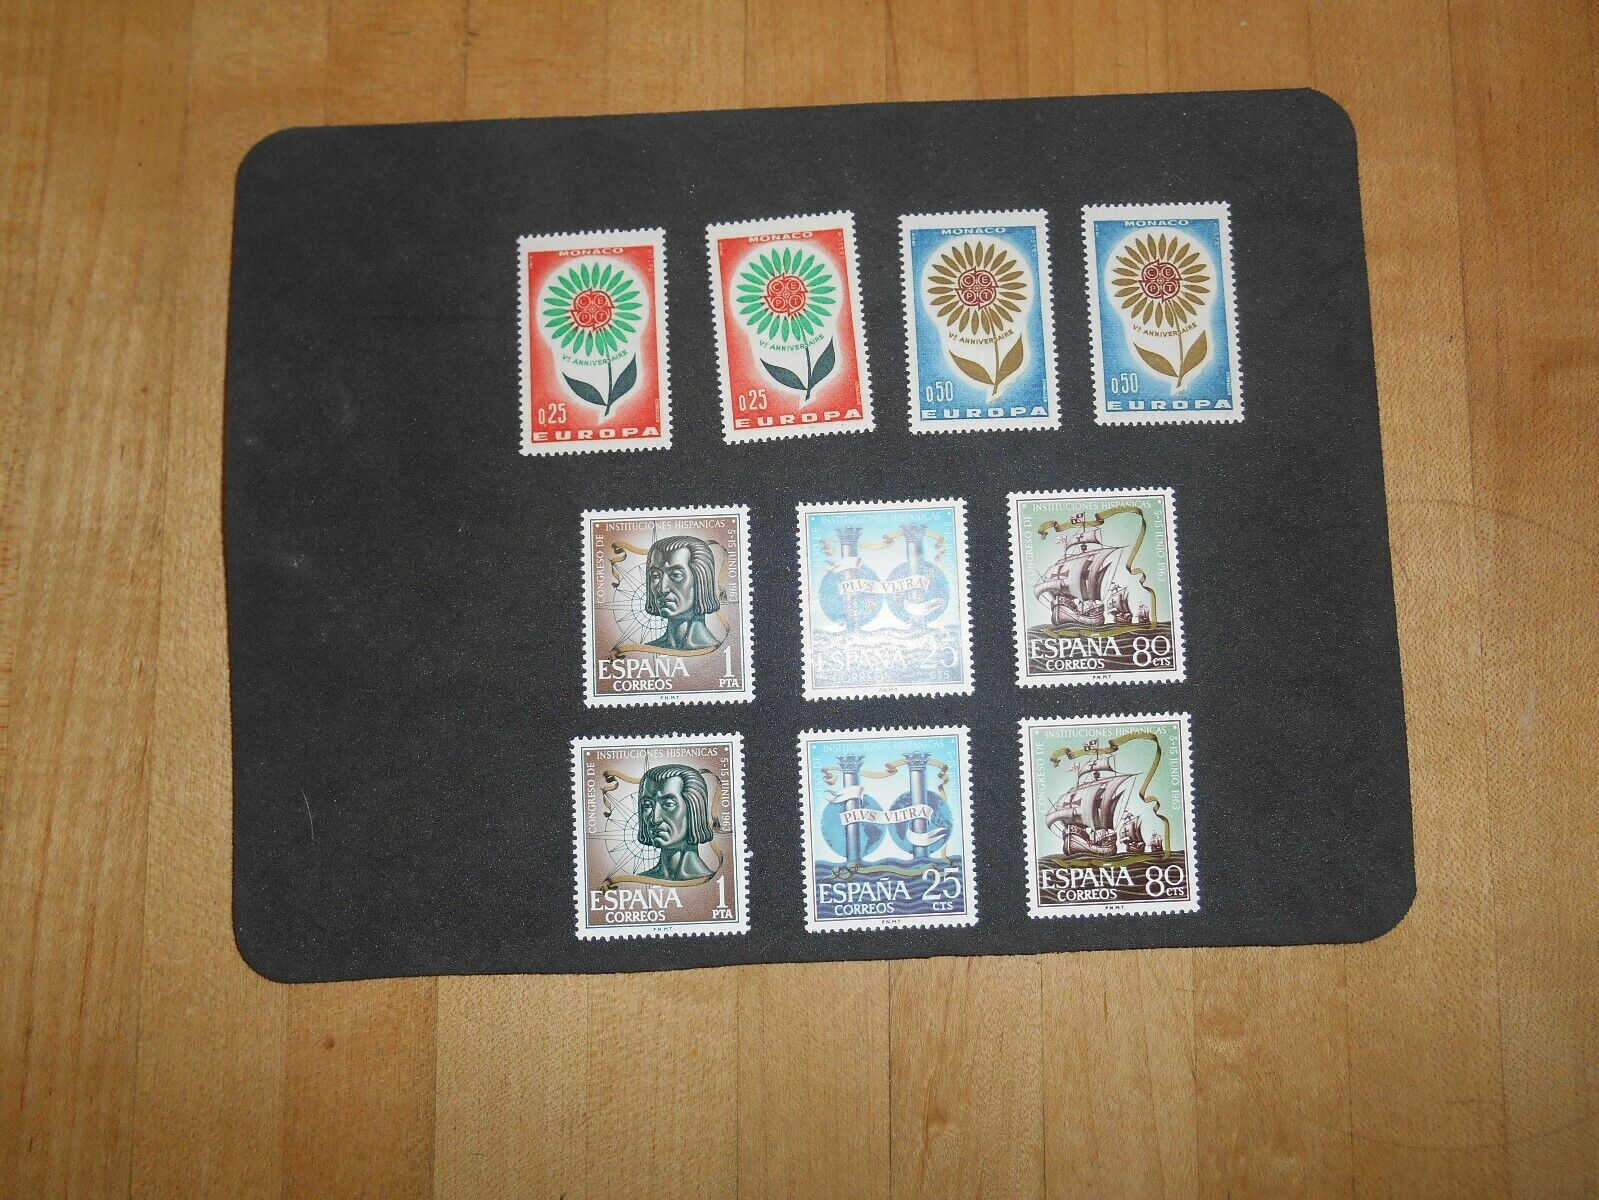 SPAIN 1963 MNH Sc 1174-1176 SPANISH CULTURE, MONACO EUROPA Sc 590-591 MNH. - $1.50